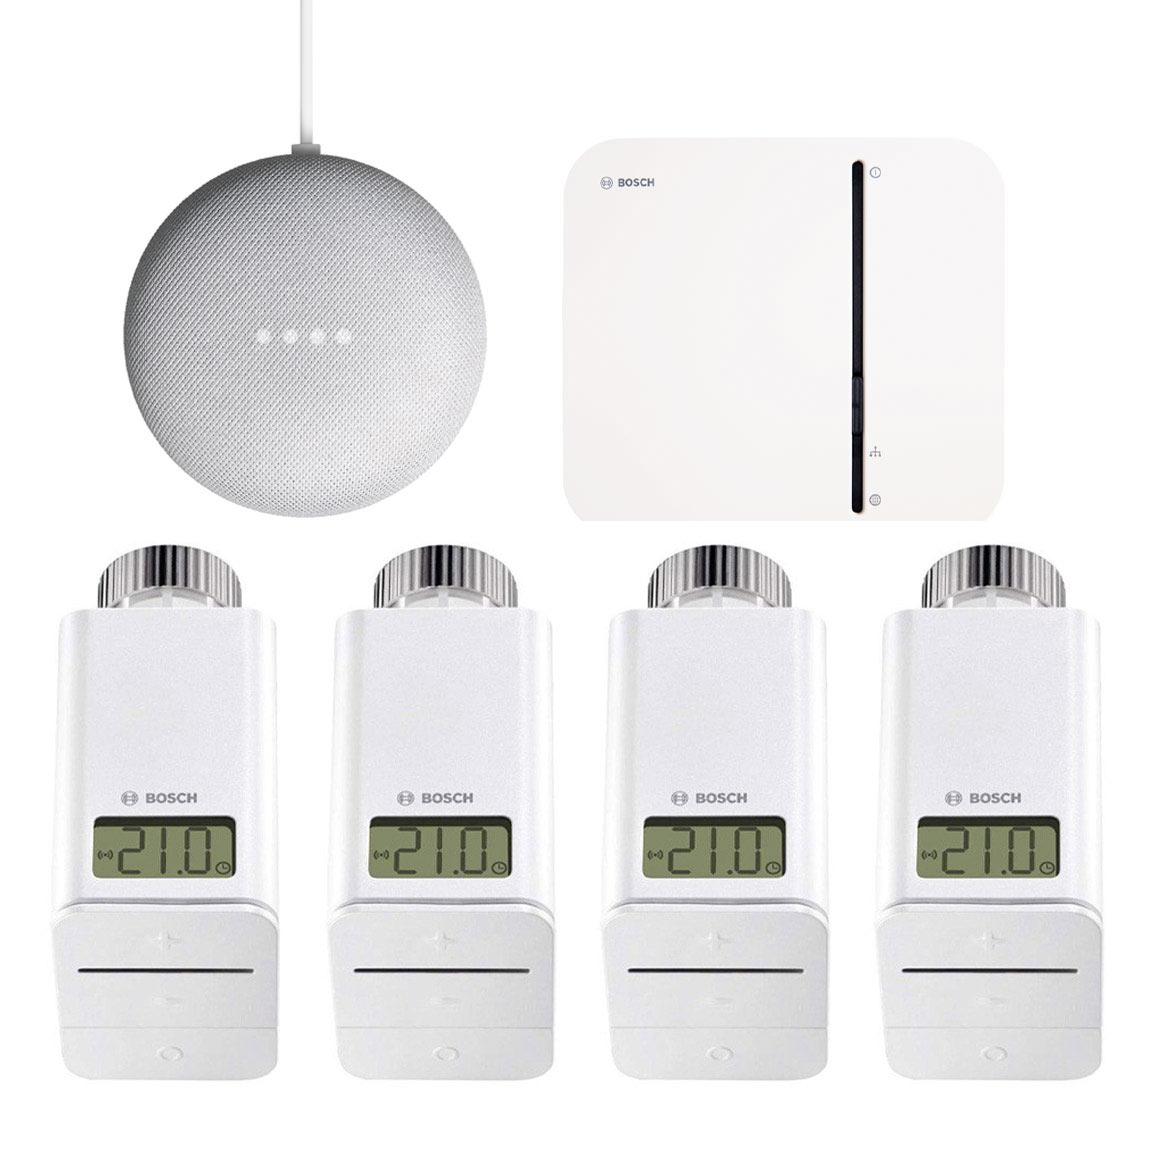 Bosch Smart Home - Starter Set Heizung + gratis Google Nest Mini + gratis Twinguard + Twist